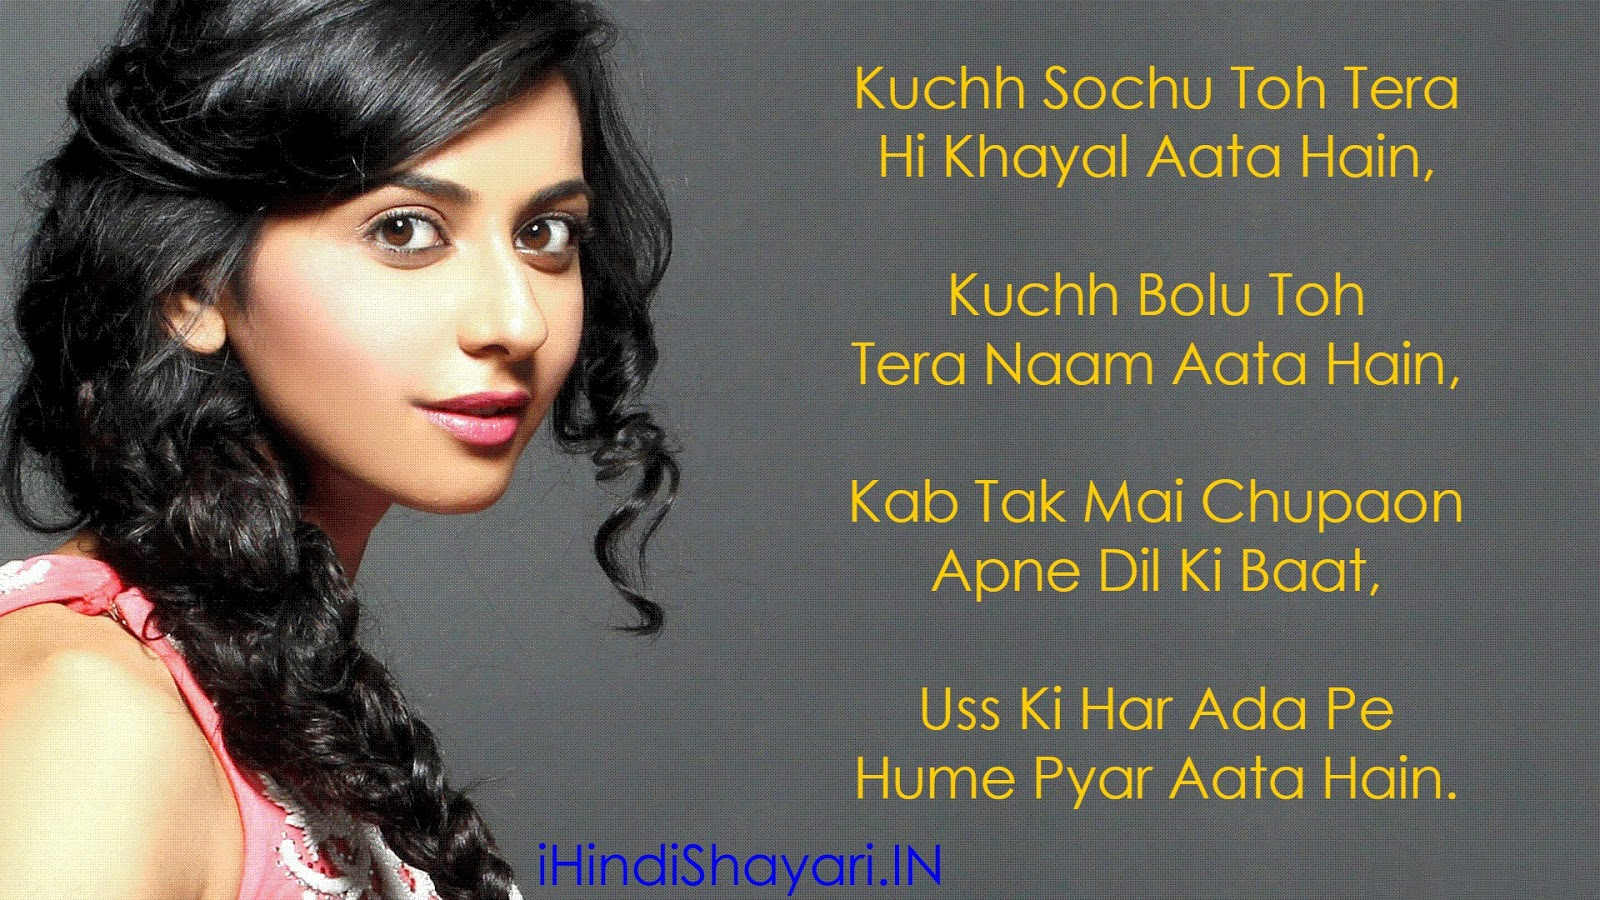 Hindi Shayari Download Images Romantic Girl Love Hd Wallpaper-2062